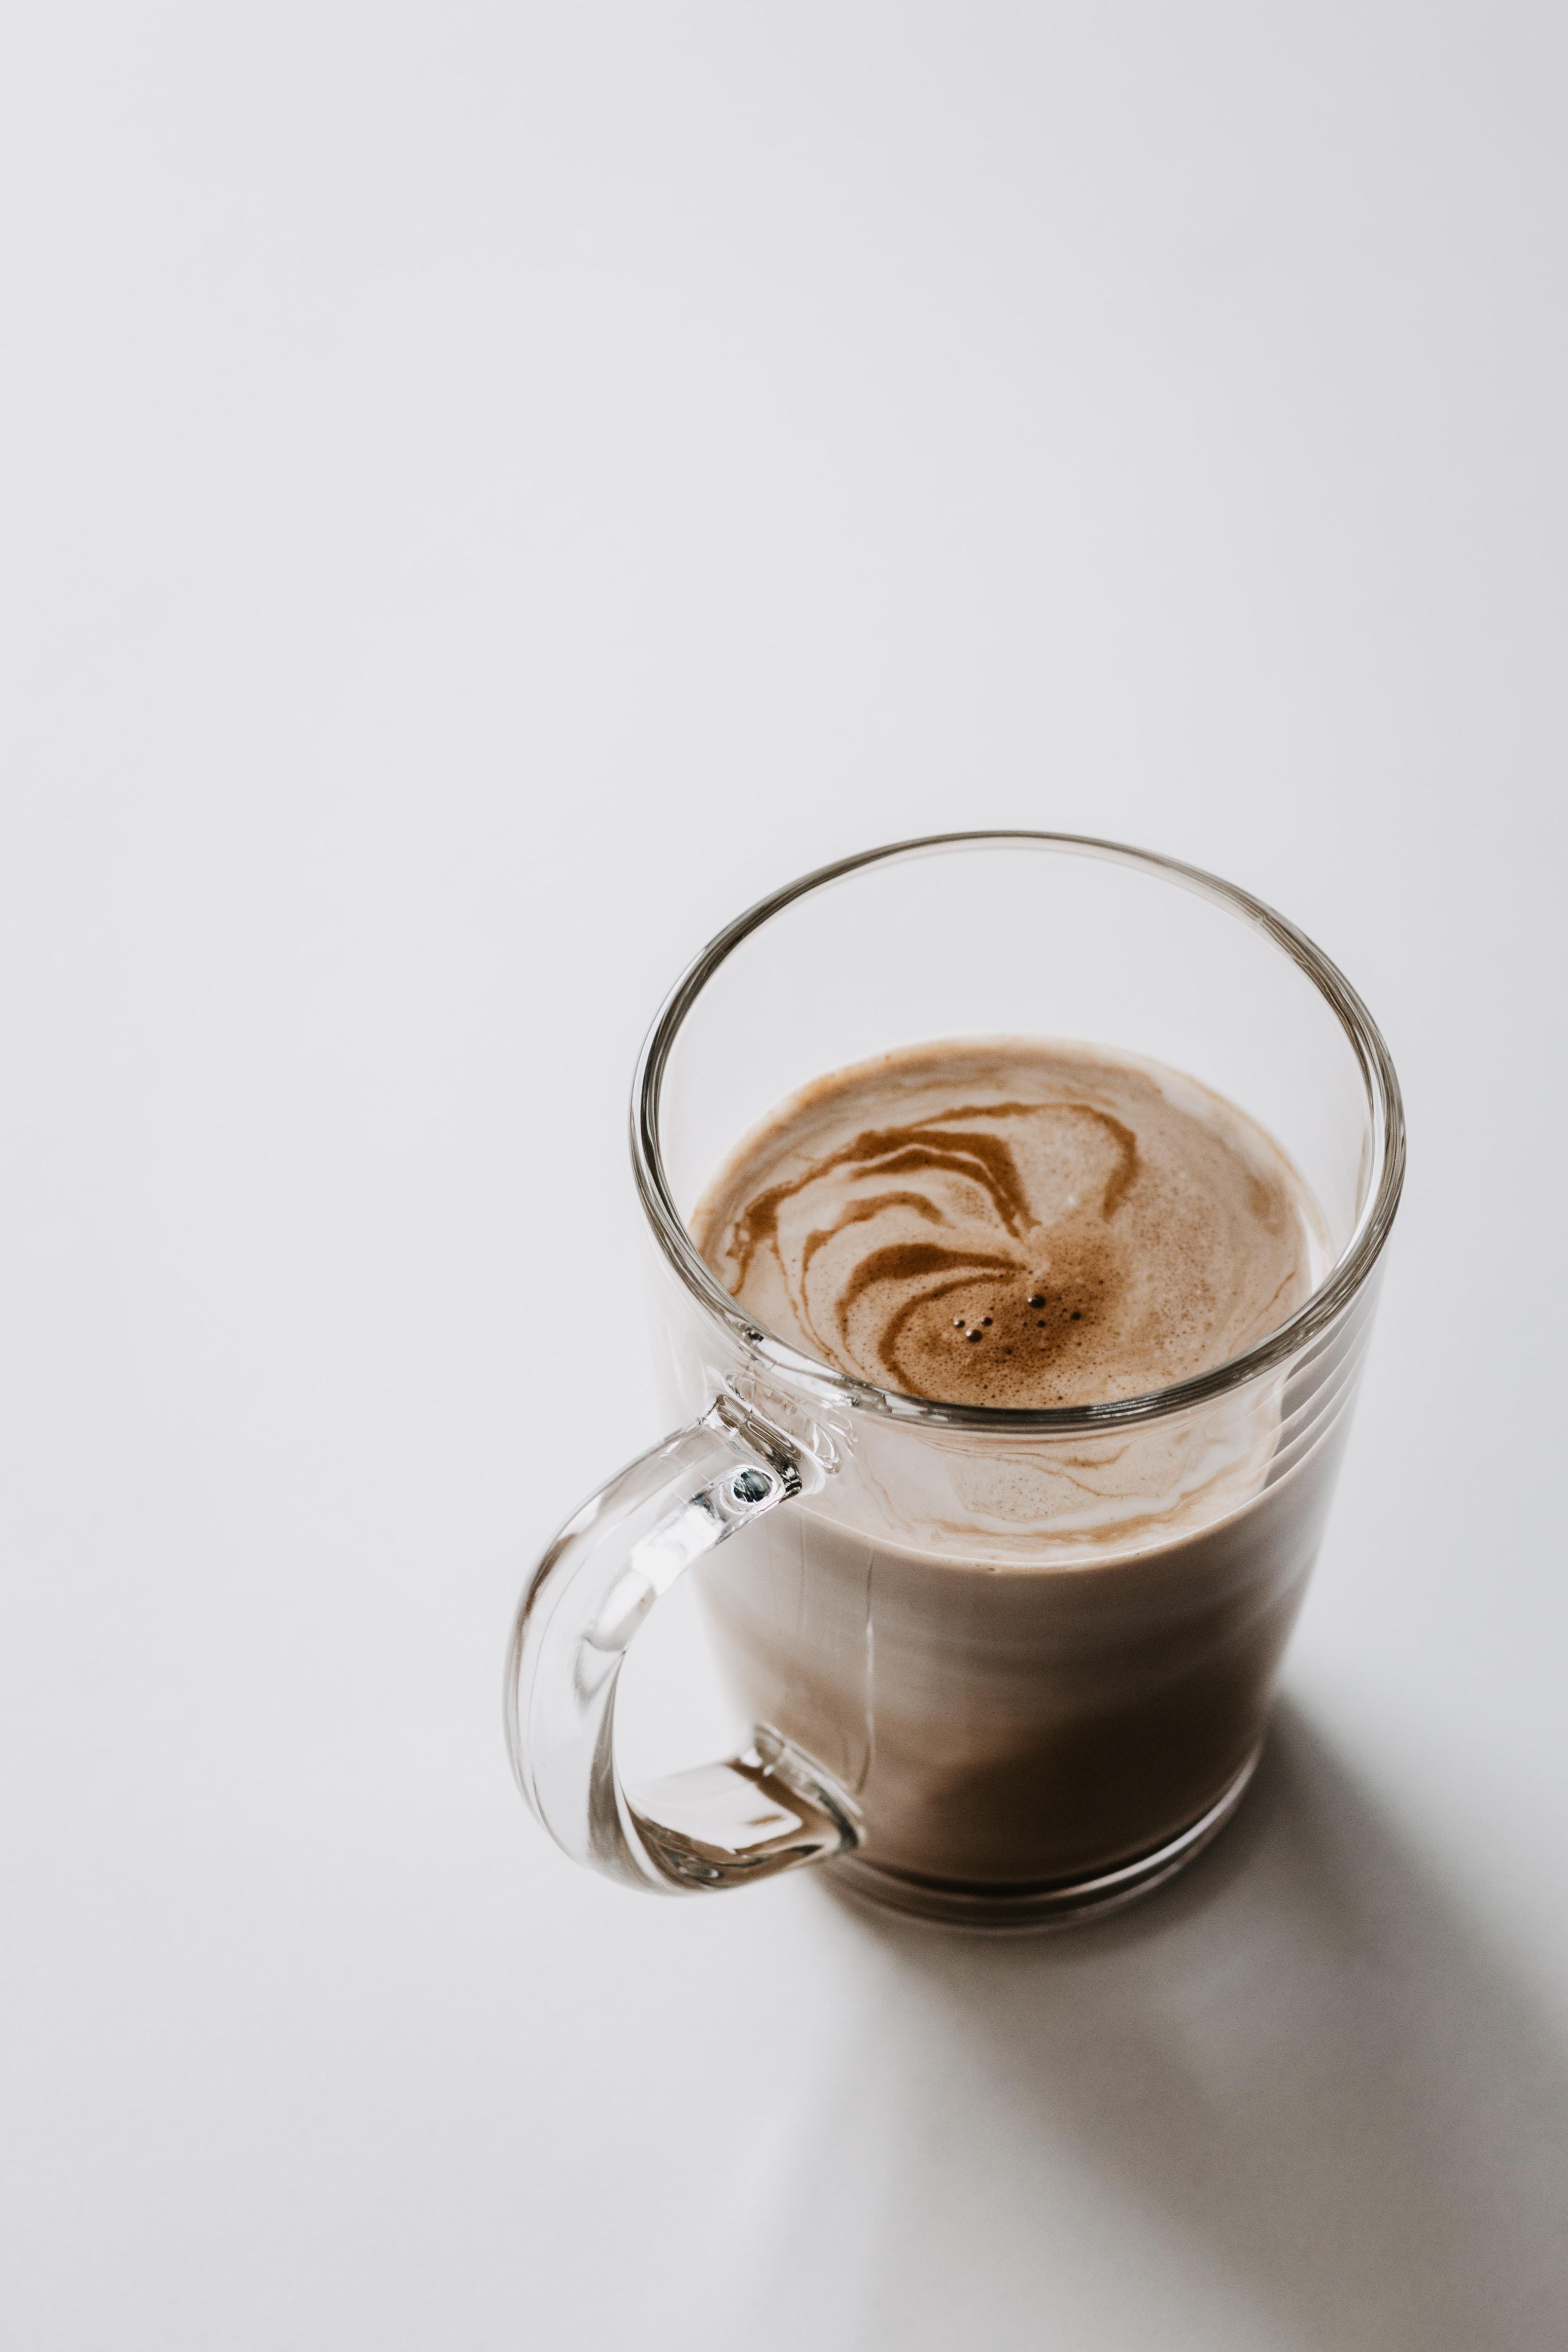 chocolate mocha serve in glass mug